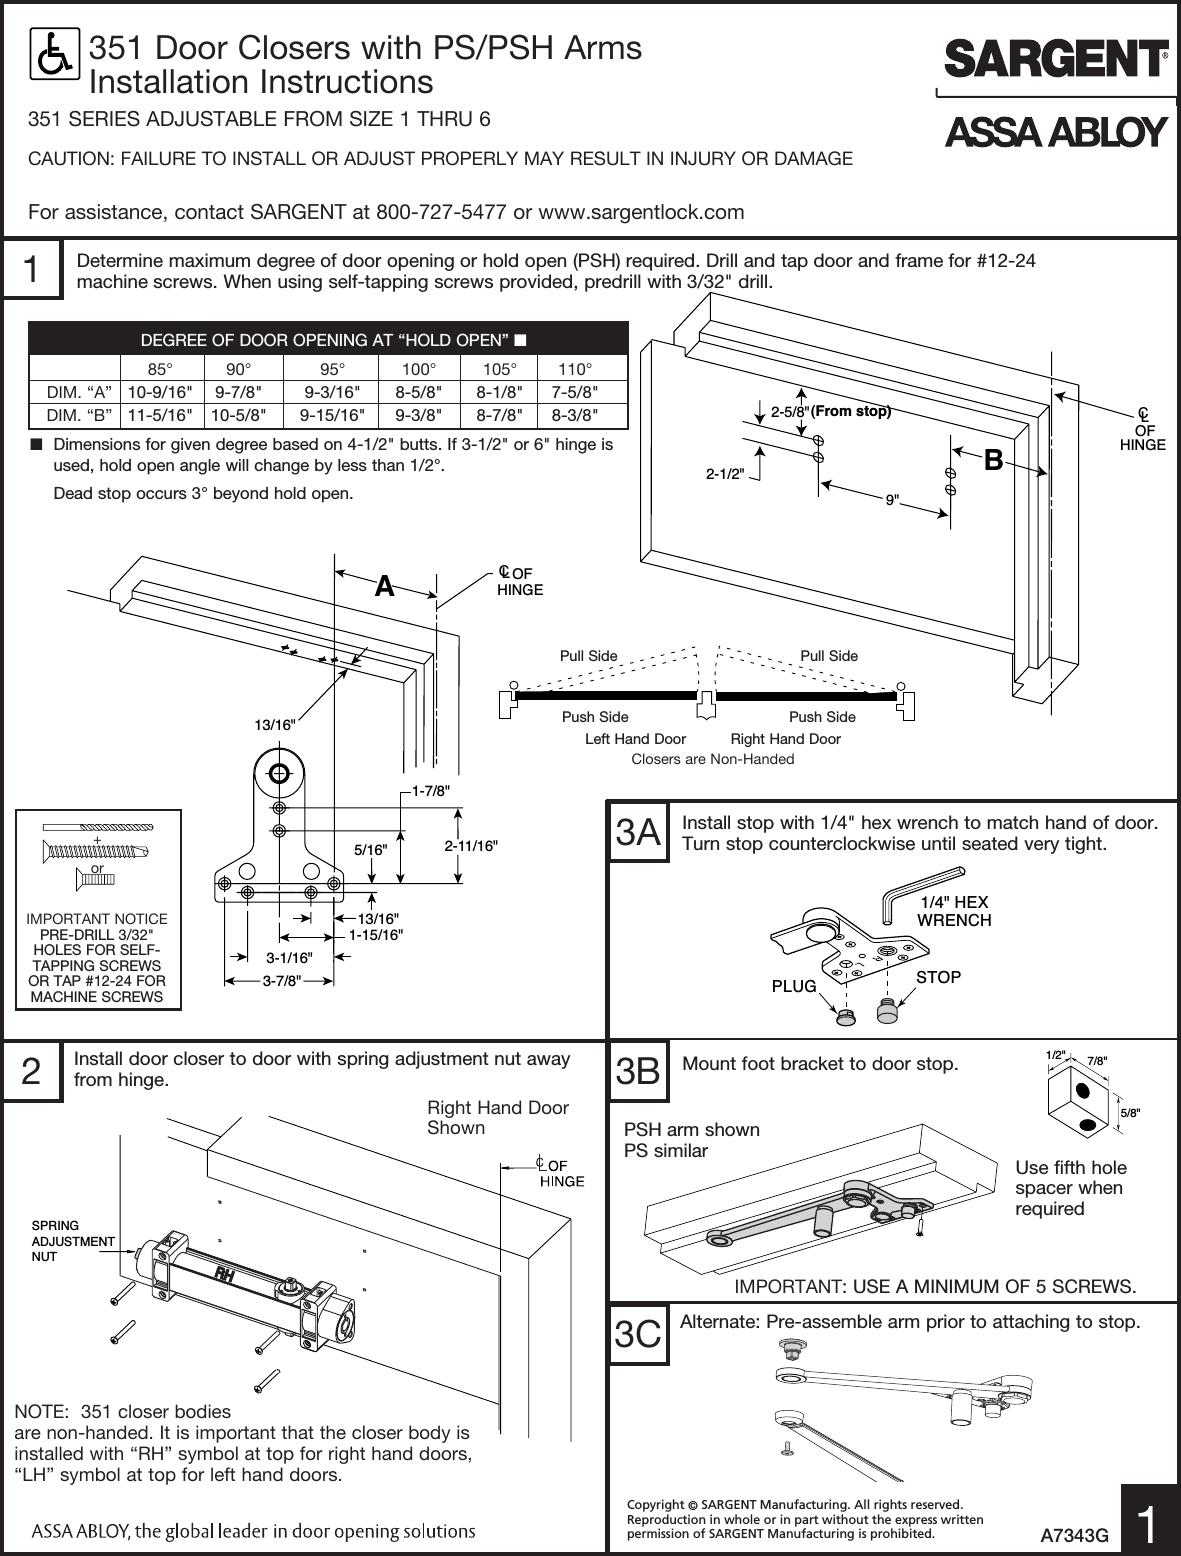 sargent 351 door closer installation instructions